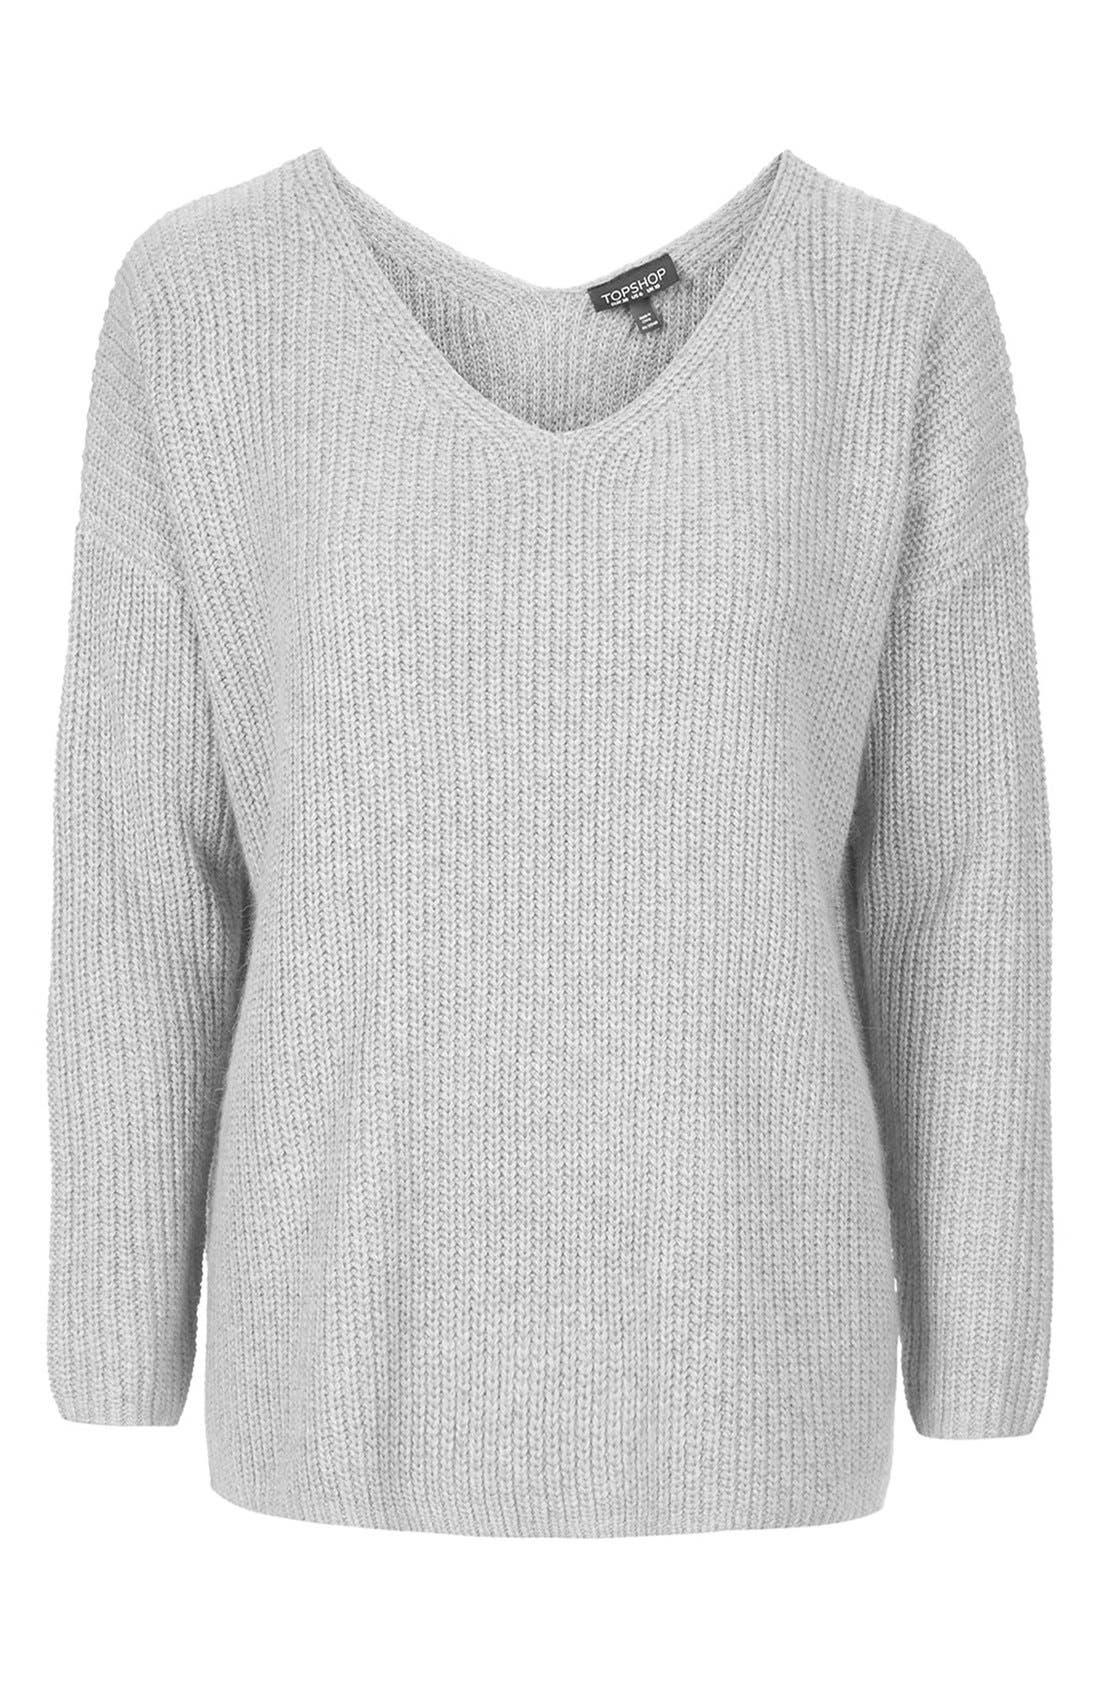 Alternate Image 2  - Topshop Double V-Neck Rib Sweater